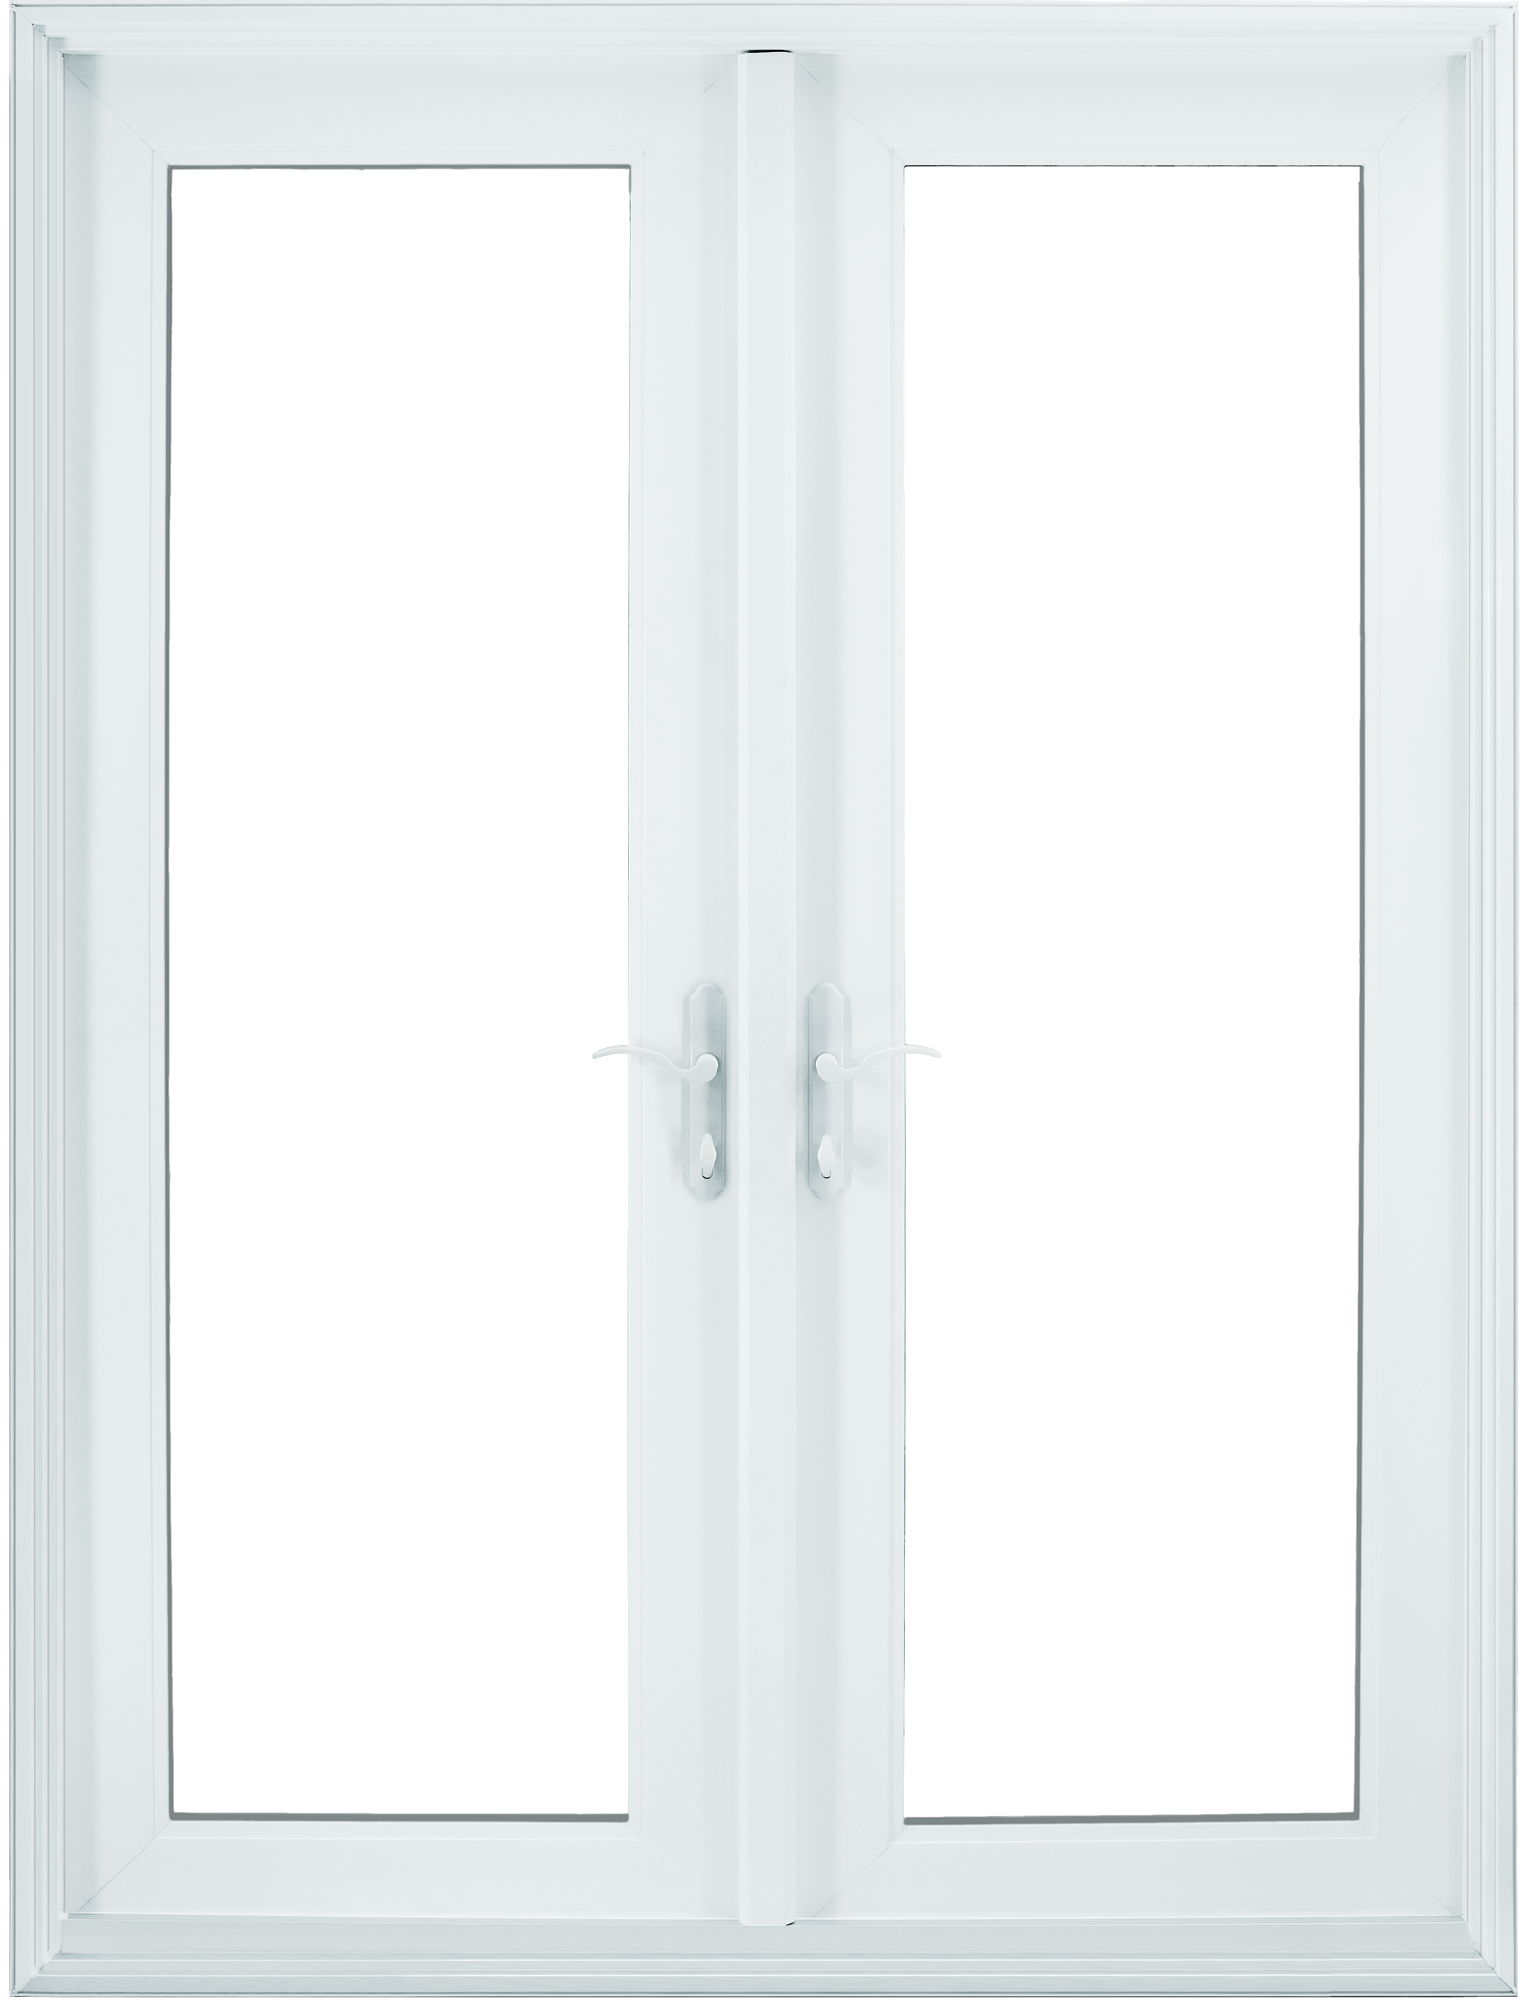 Replacing glass on swinging patio doors